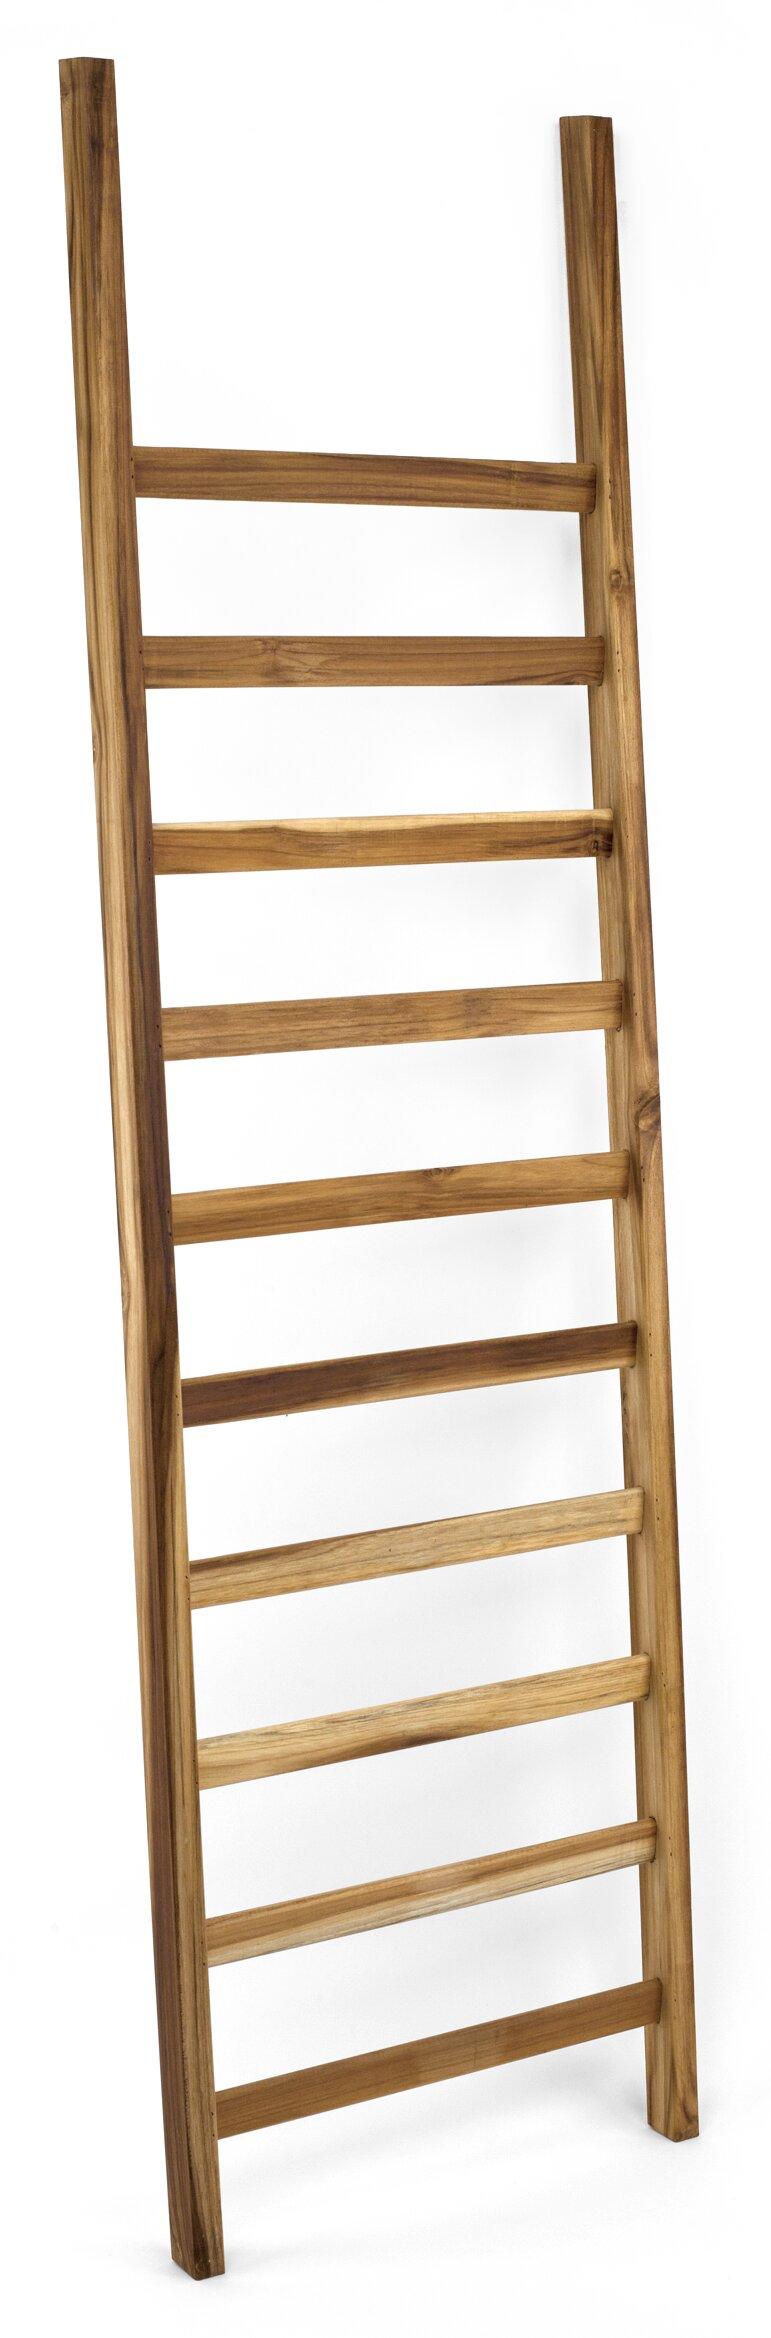 Design Ideas Takara 5 ft Decorative Ladder | Wayfair